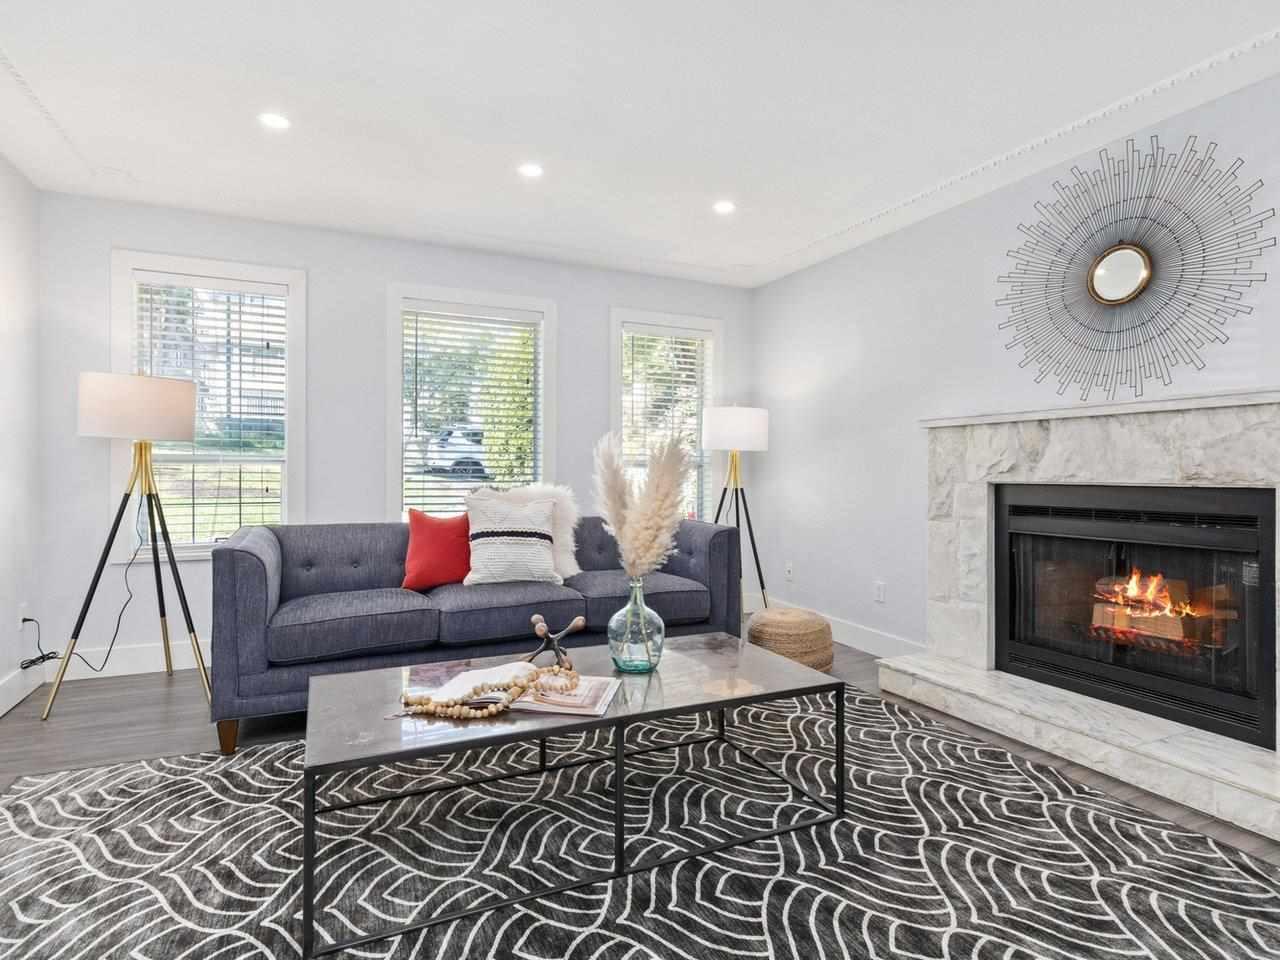 3248 E 7TH AVENUE - Renfrew VE House/Single Family for sale, 6 Bedrooms (R2578131)